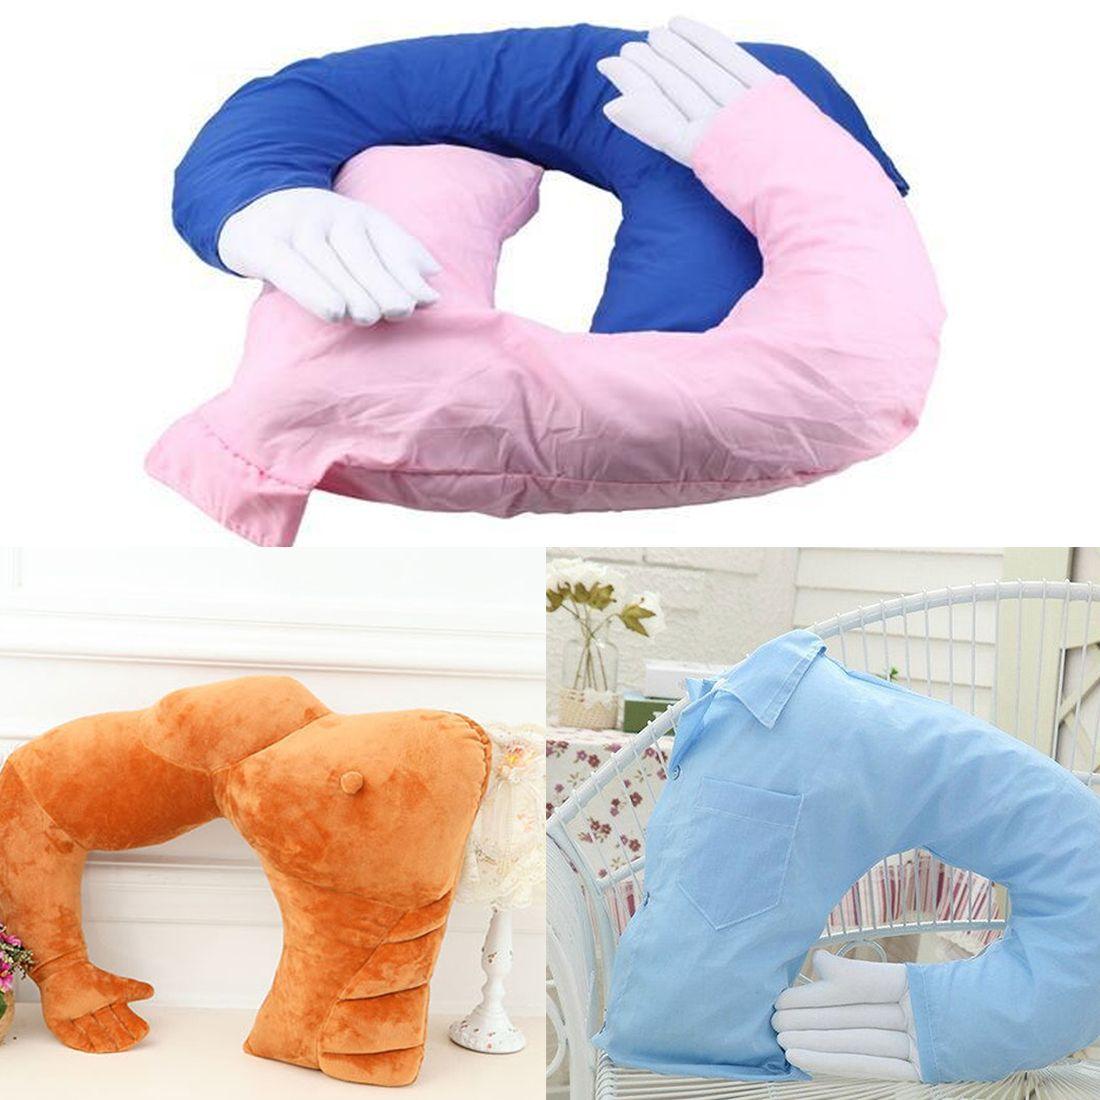 Boyfriend Arm Throw Pillow Funny Body Hug Girlfriend Cushion Bed Gift Home Decor